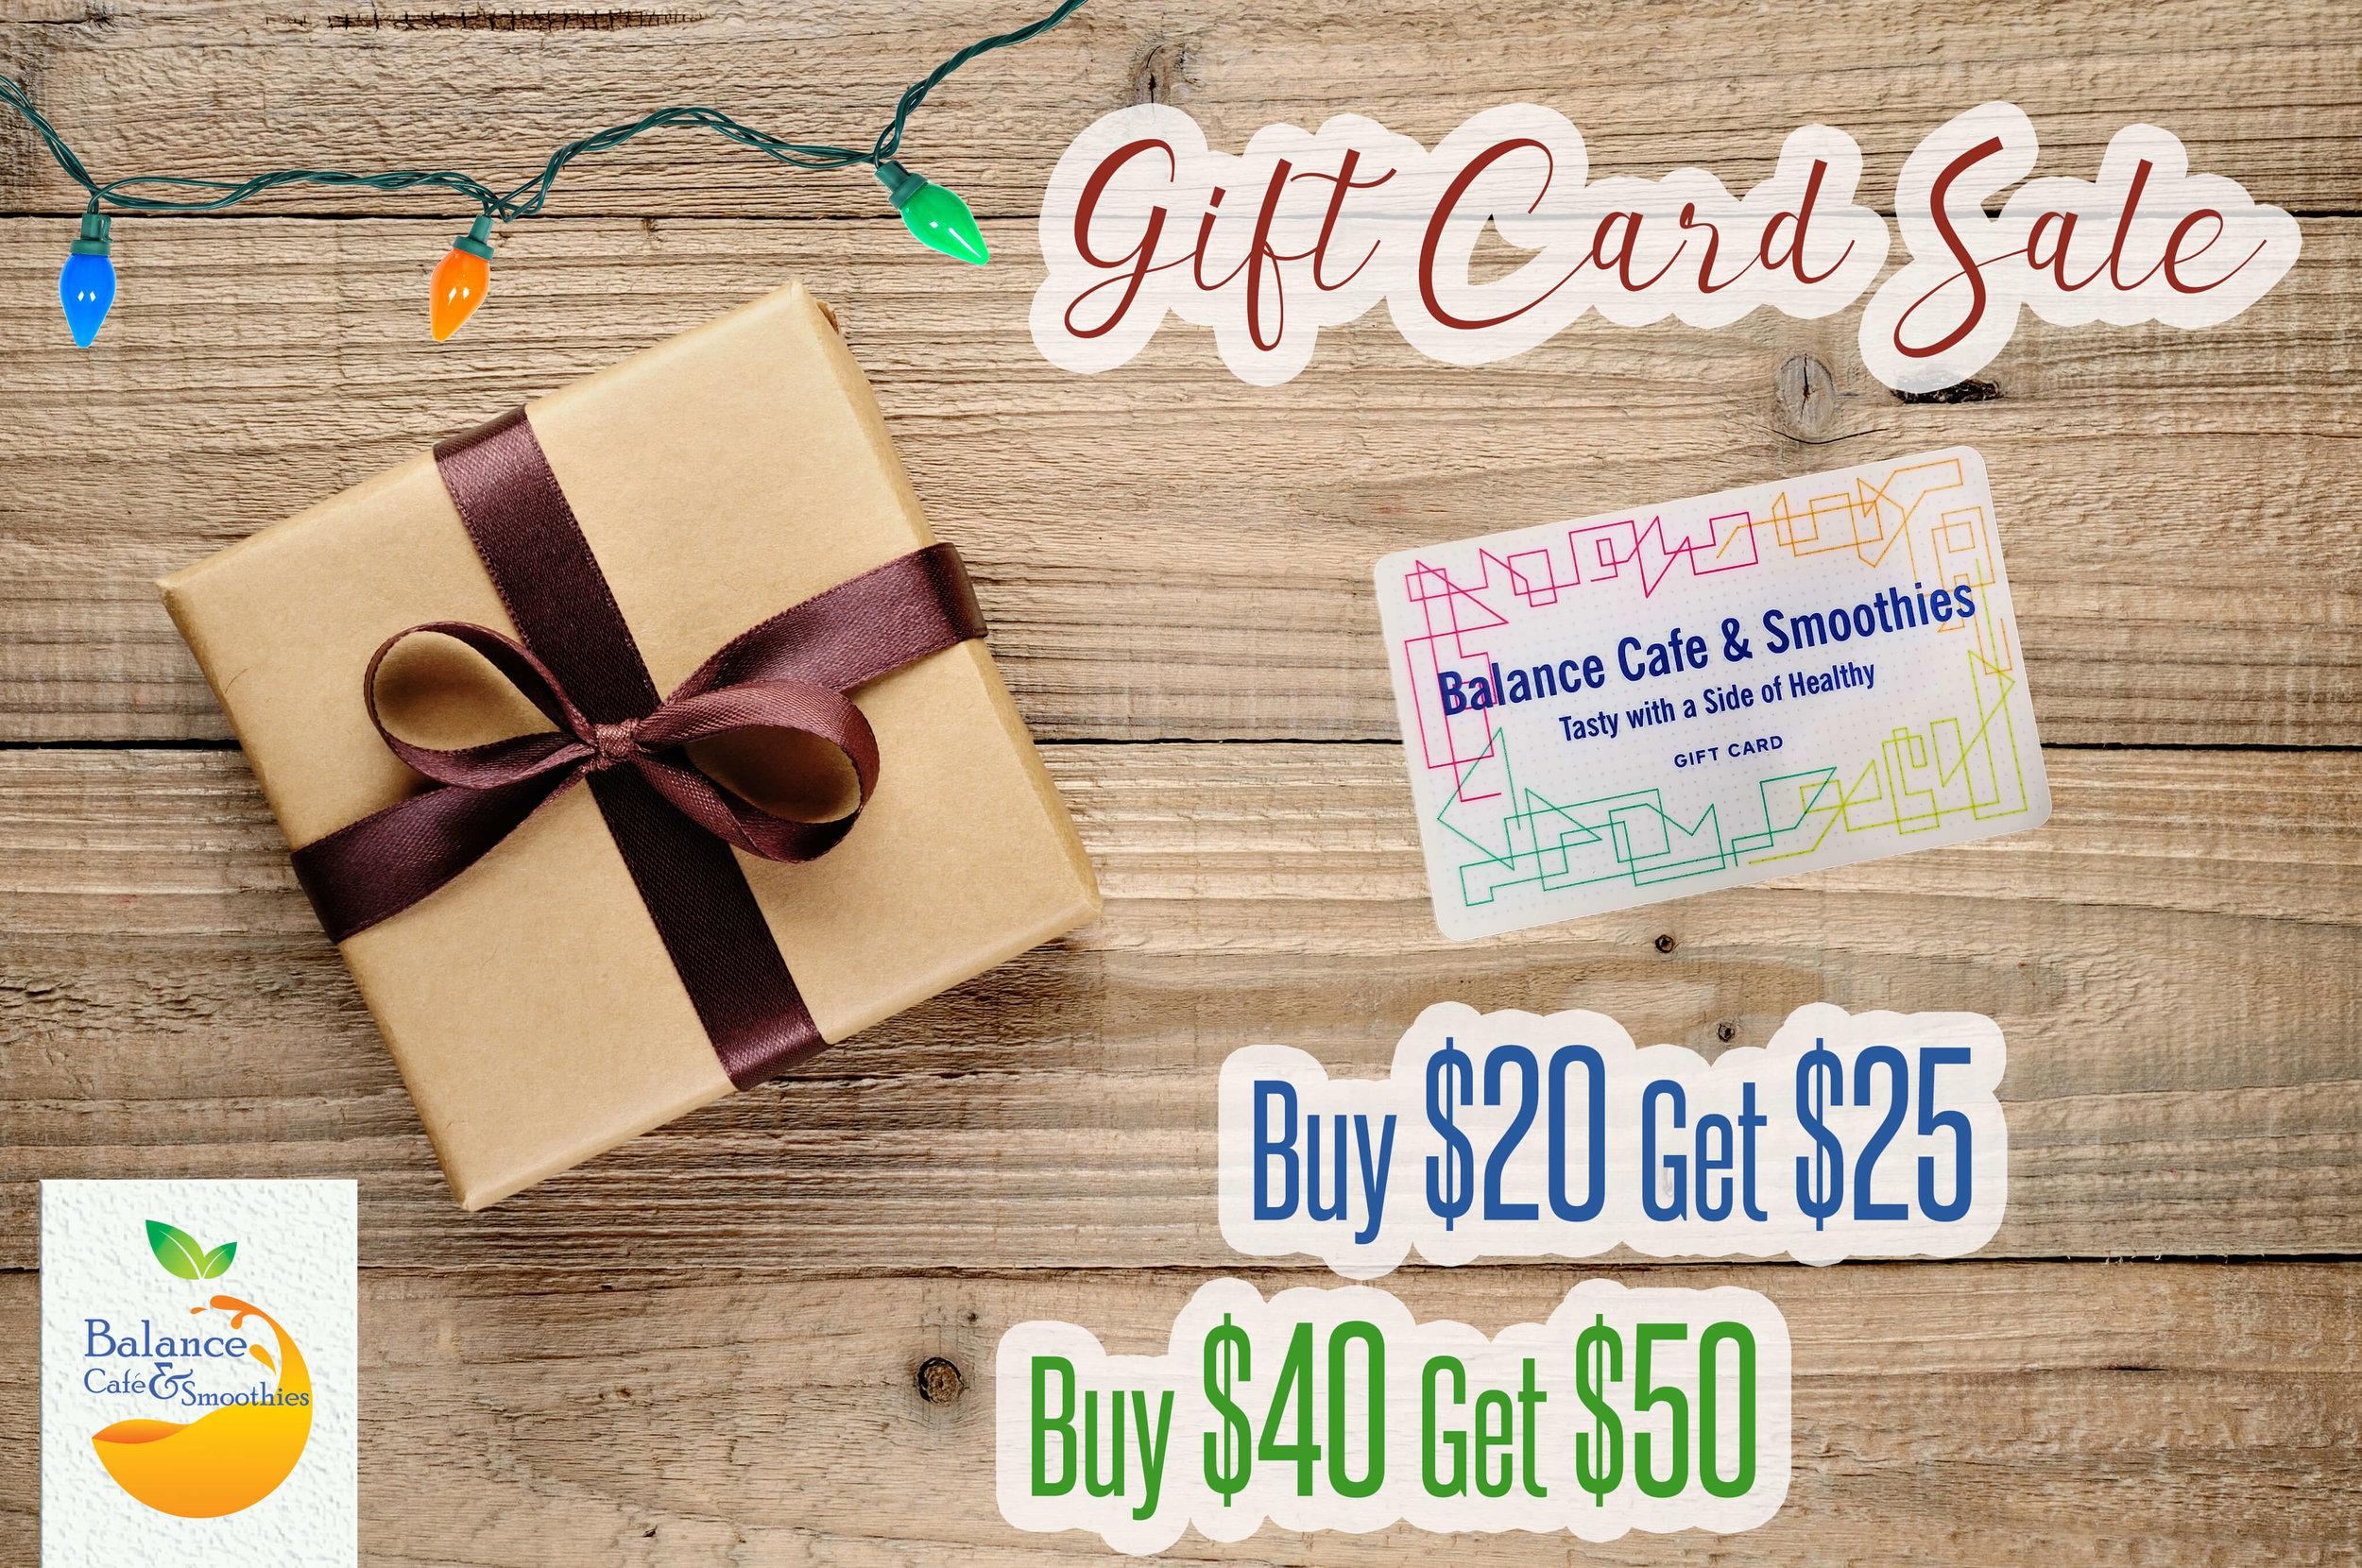 Gift Card 18 small2.jpg